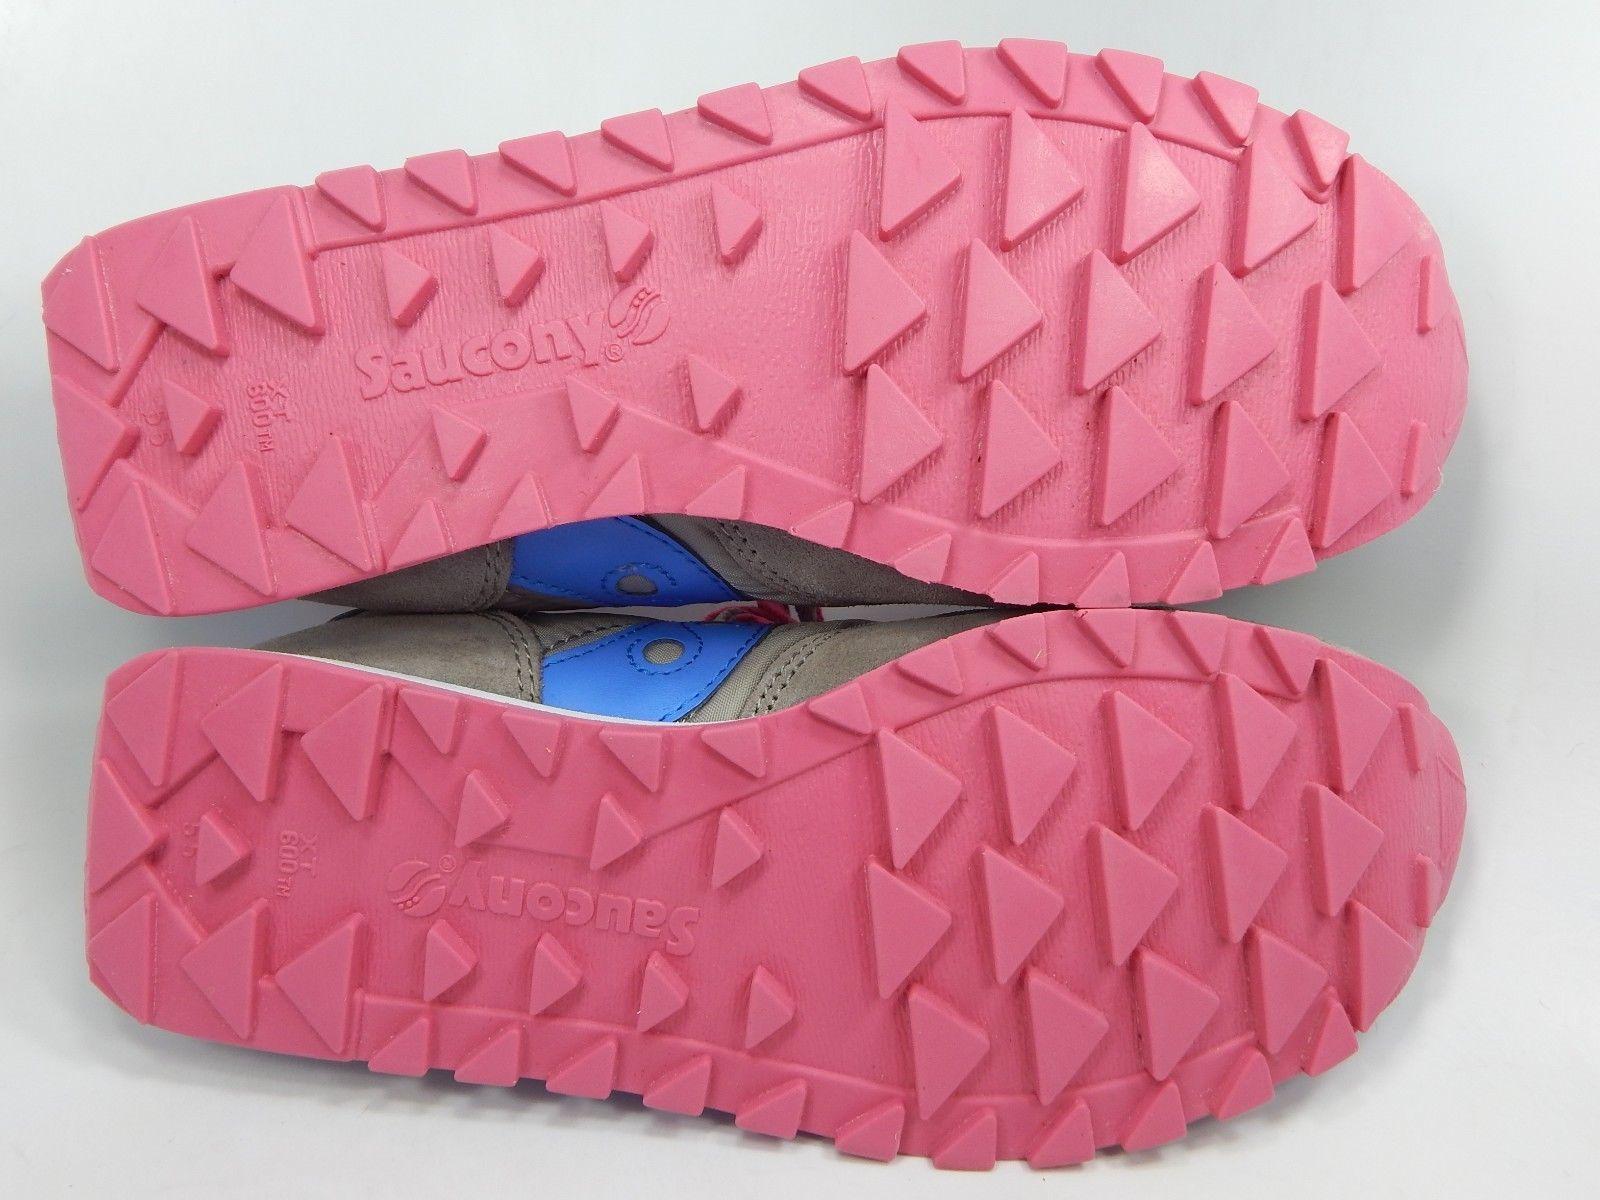 Saucony Original Jazz Low Pro Women's Shoes Size 7 M (B) EU 38 Grey S1866-186